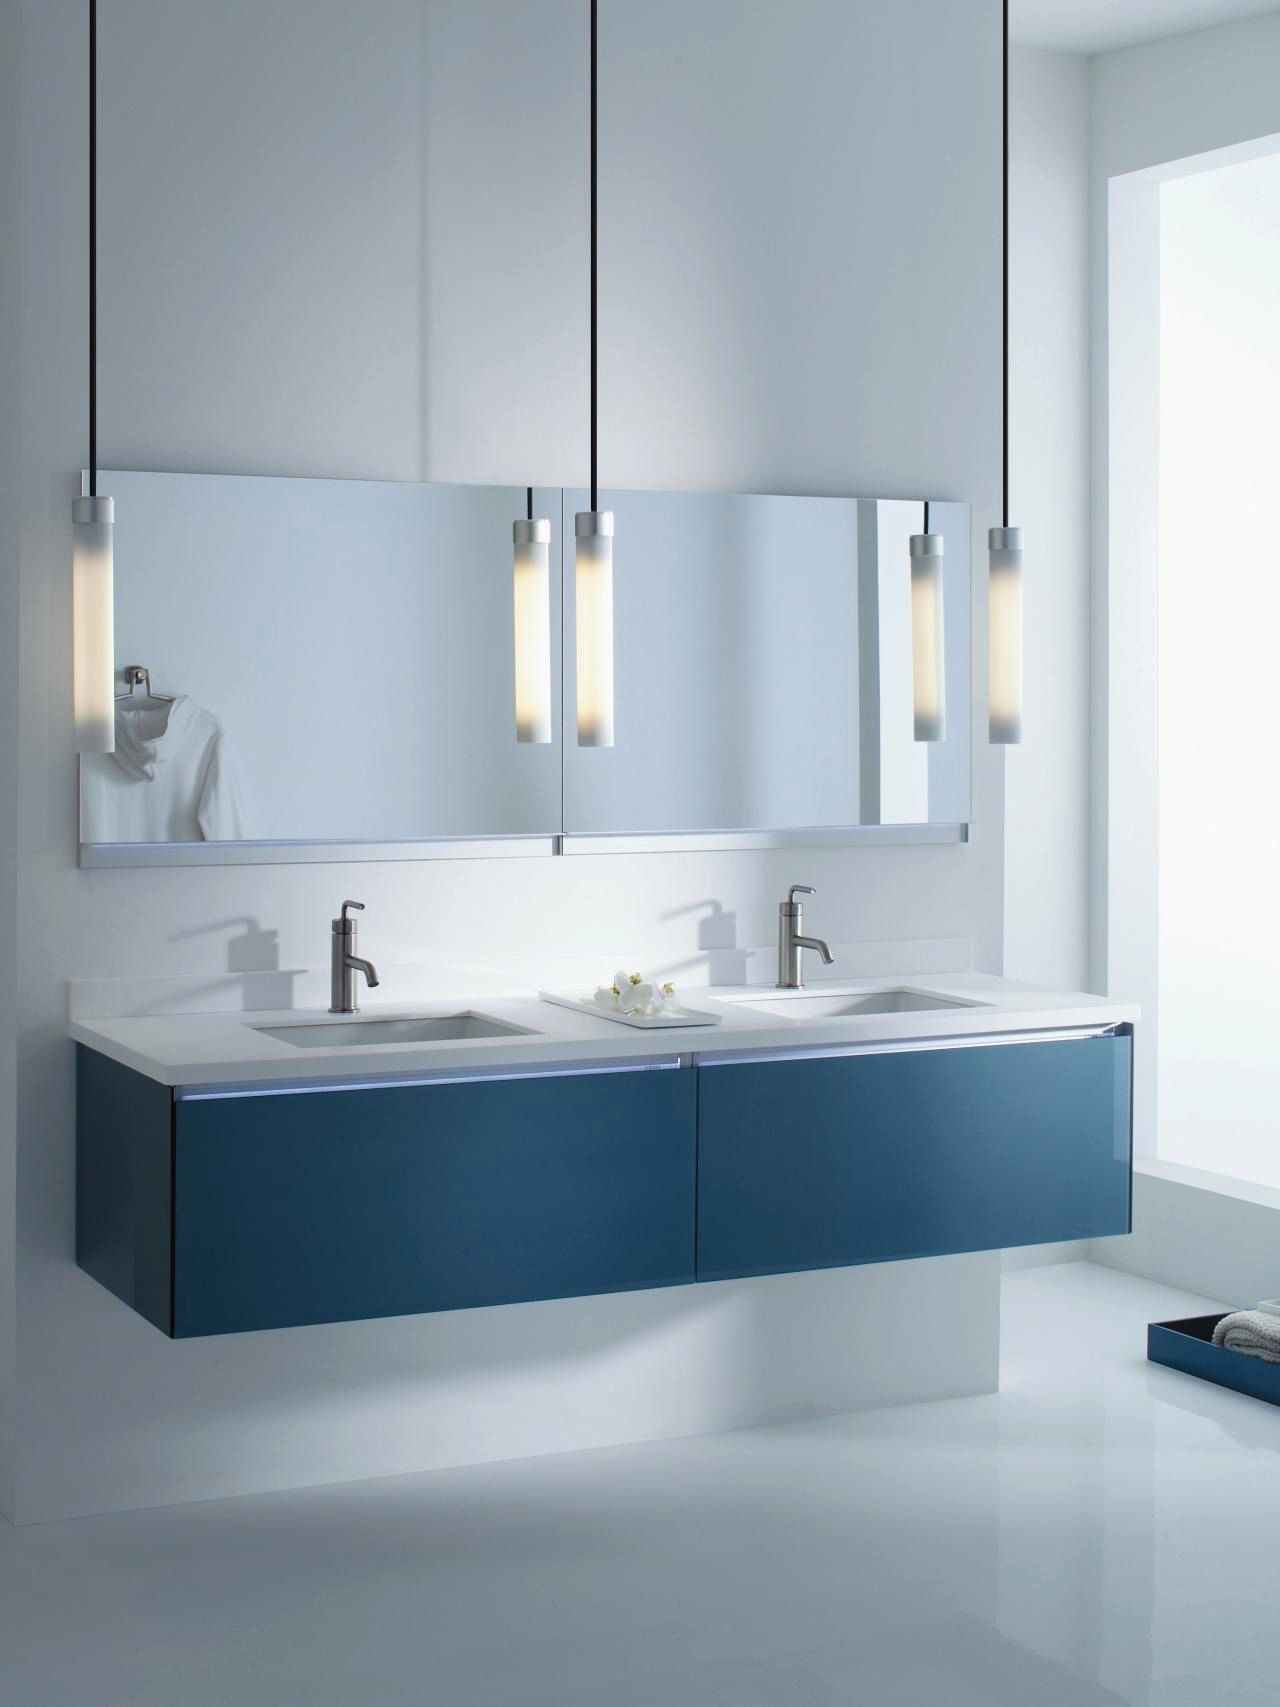 Top Bathroom Shower Storage Pattern - Bathroom Design Ideas Gallery ...